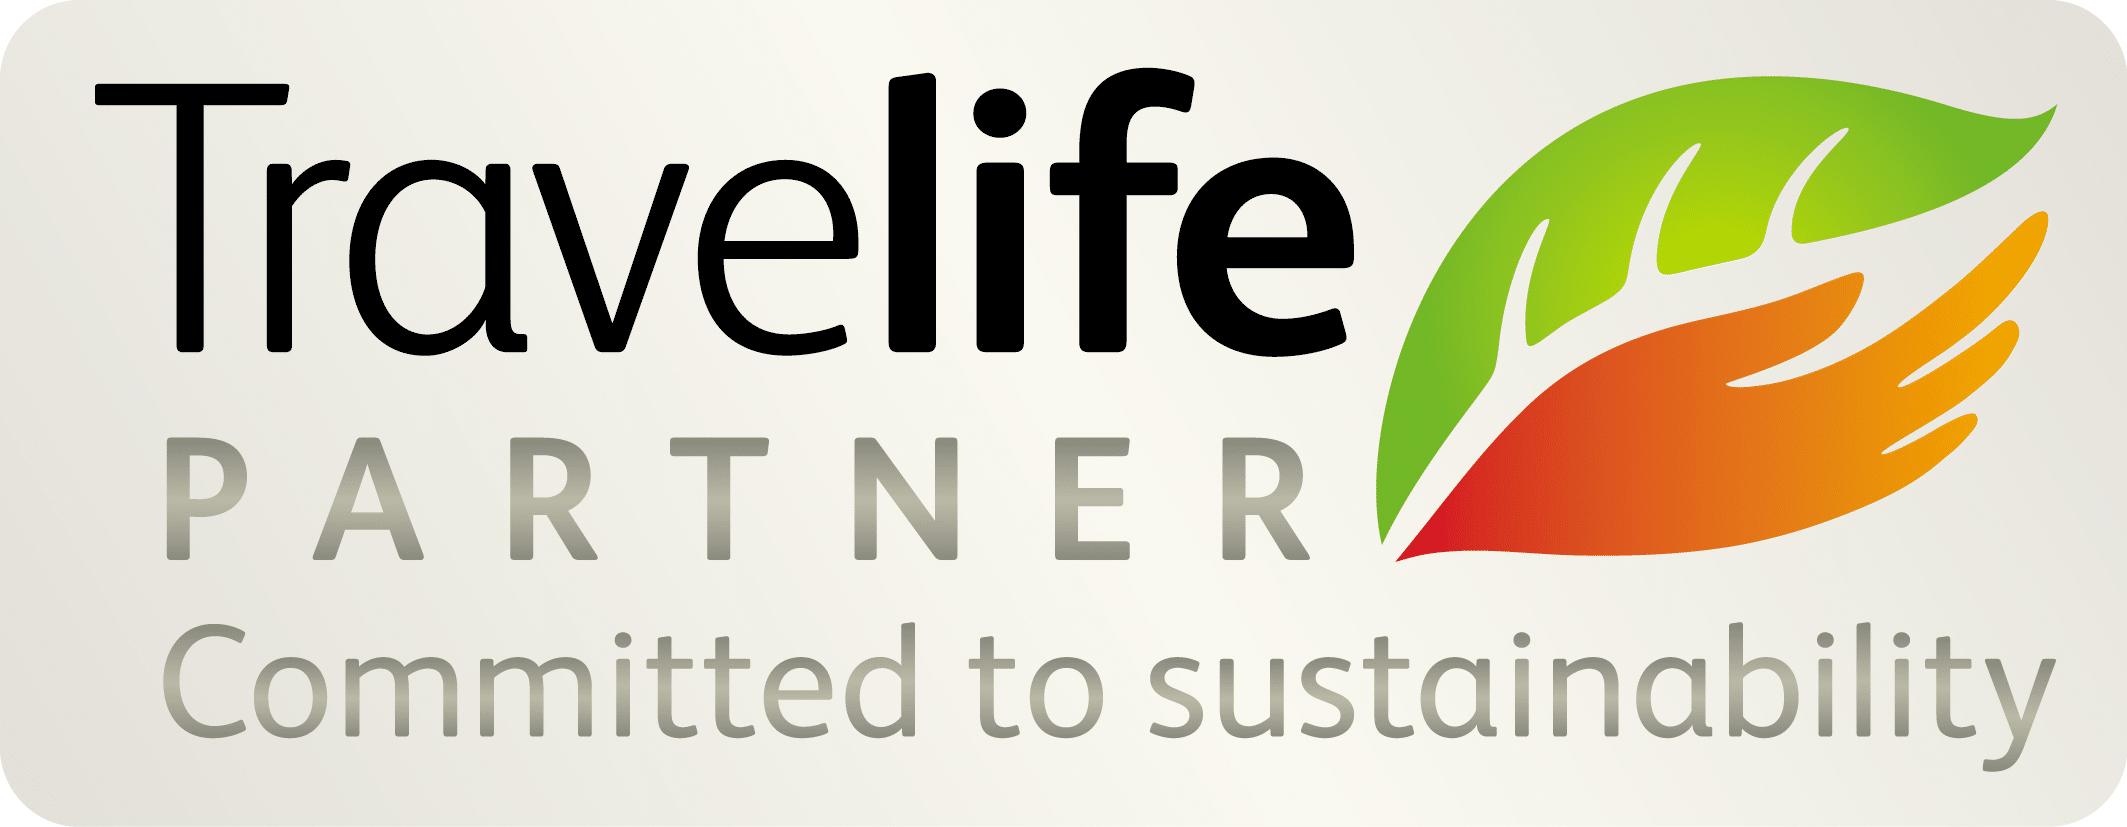 Travelife Partner Certified